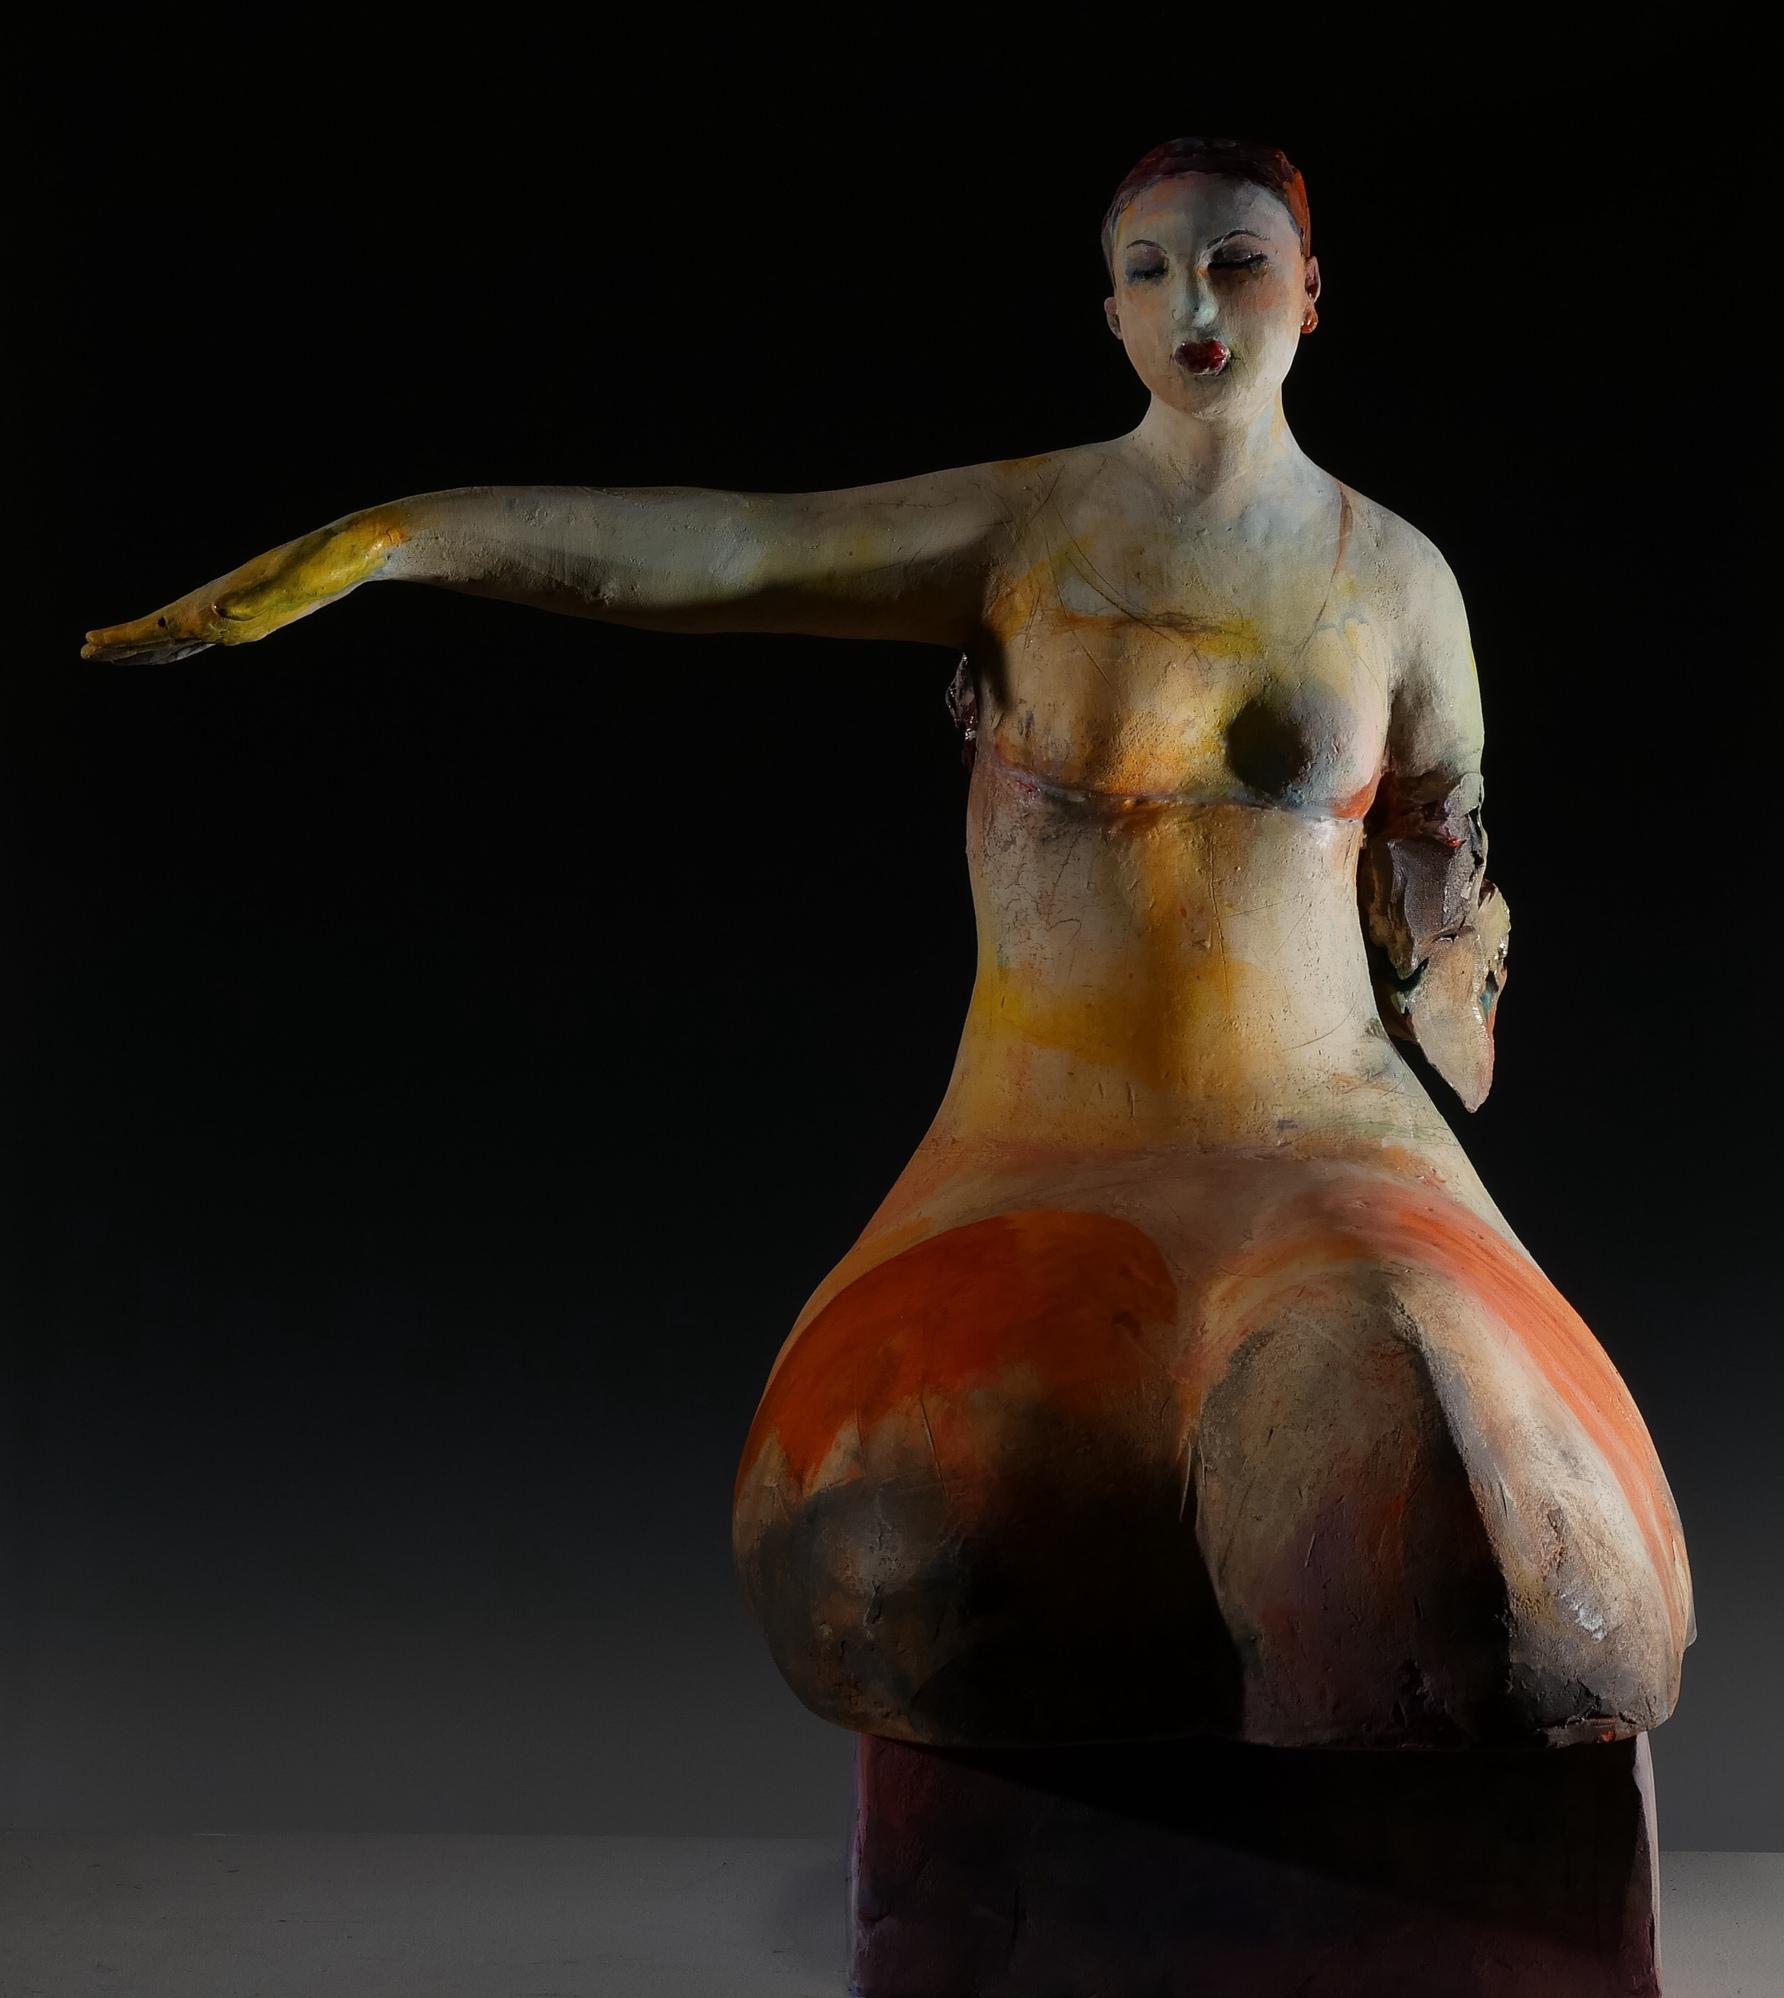 Michelle-Gregor-Euphrates-33-x27-x24-.jpg